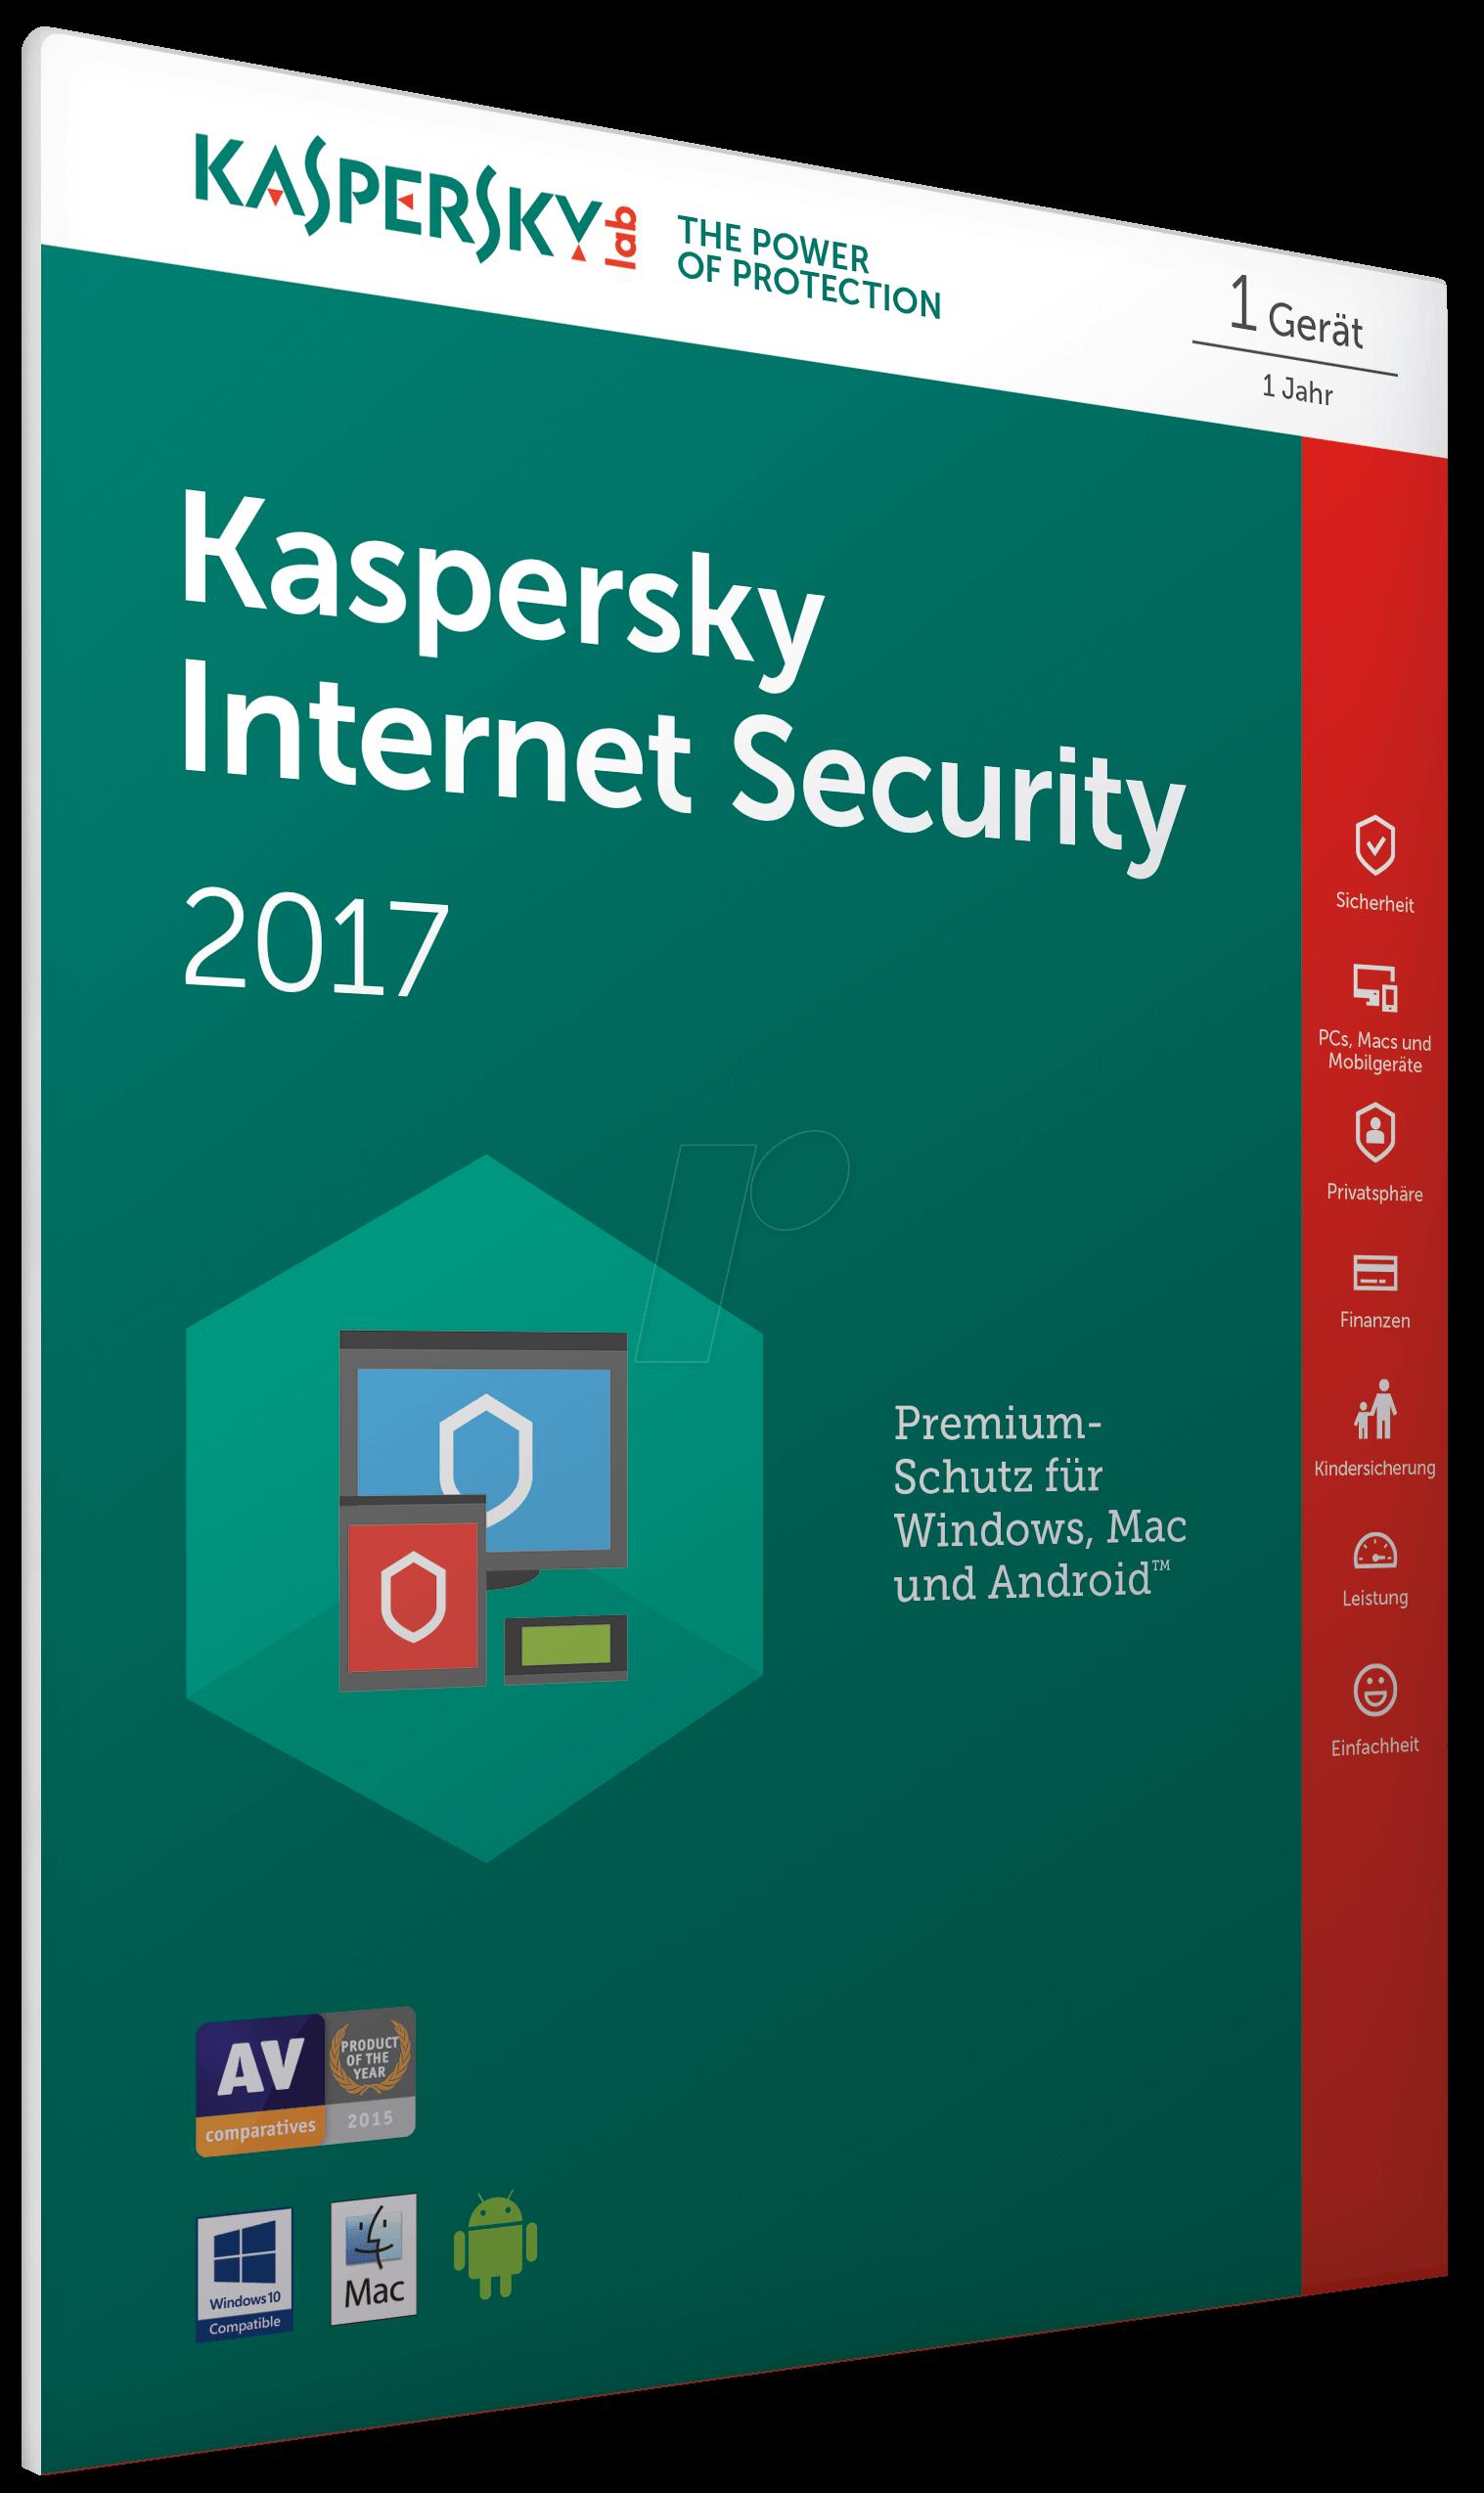 https://cdn-reichelt.de/bilder/web/xxl_ws/G500/KASPERSKY_IS2017_01.png